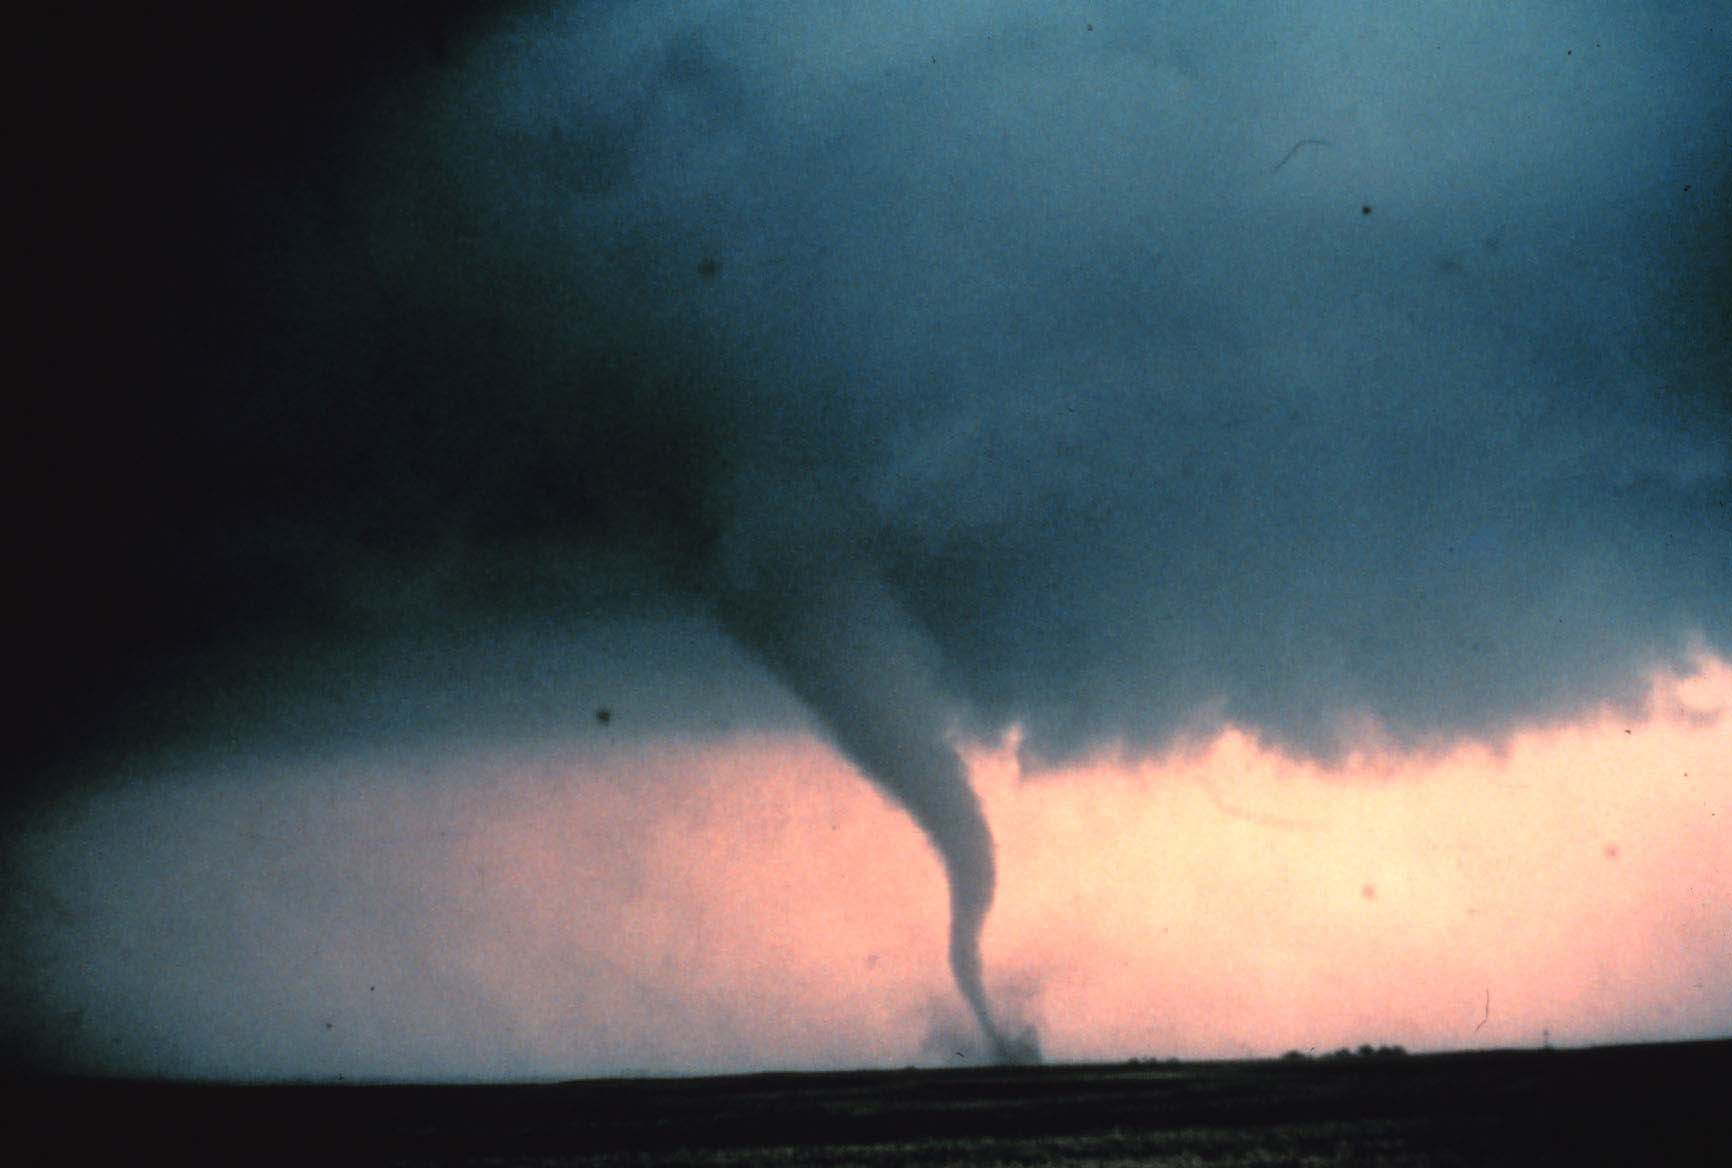 Tornado touching down in Oklahoma